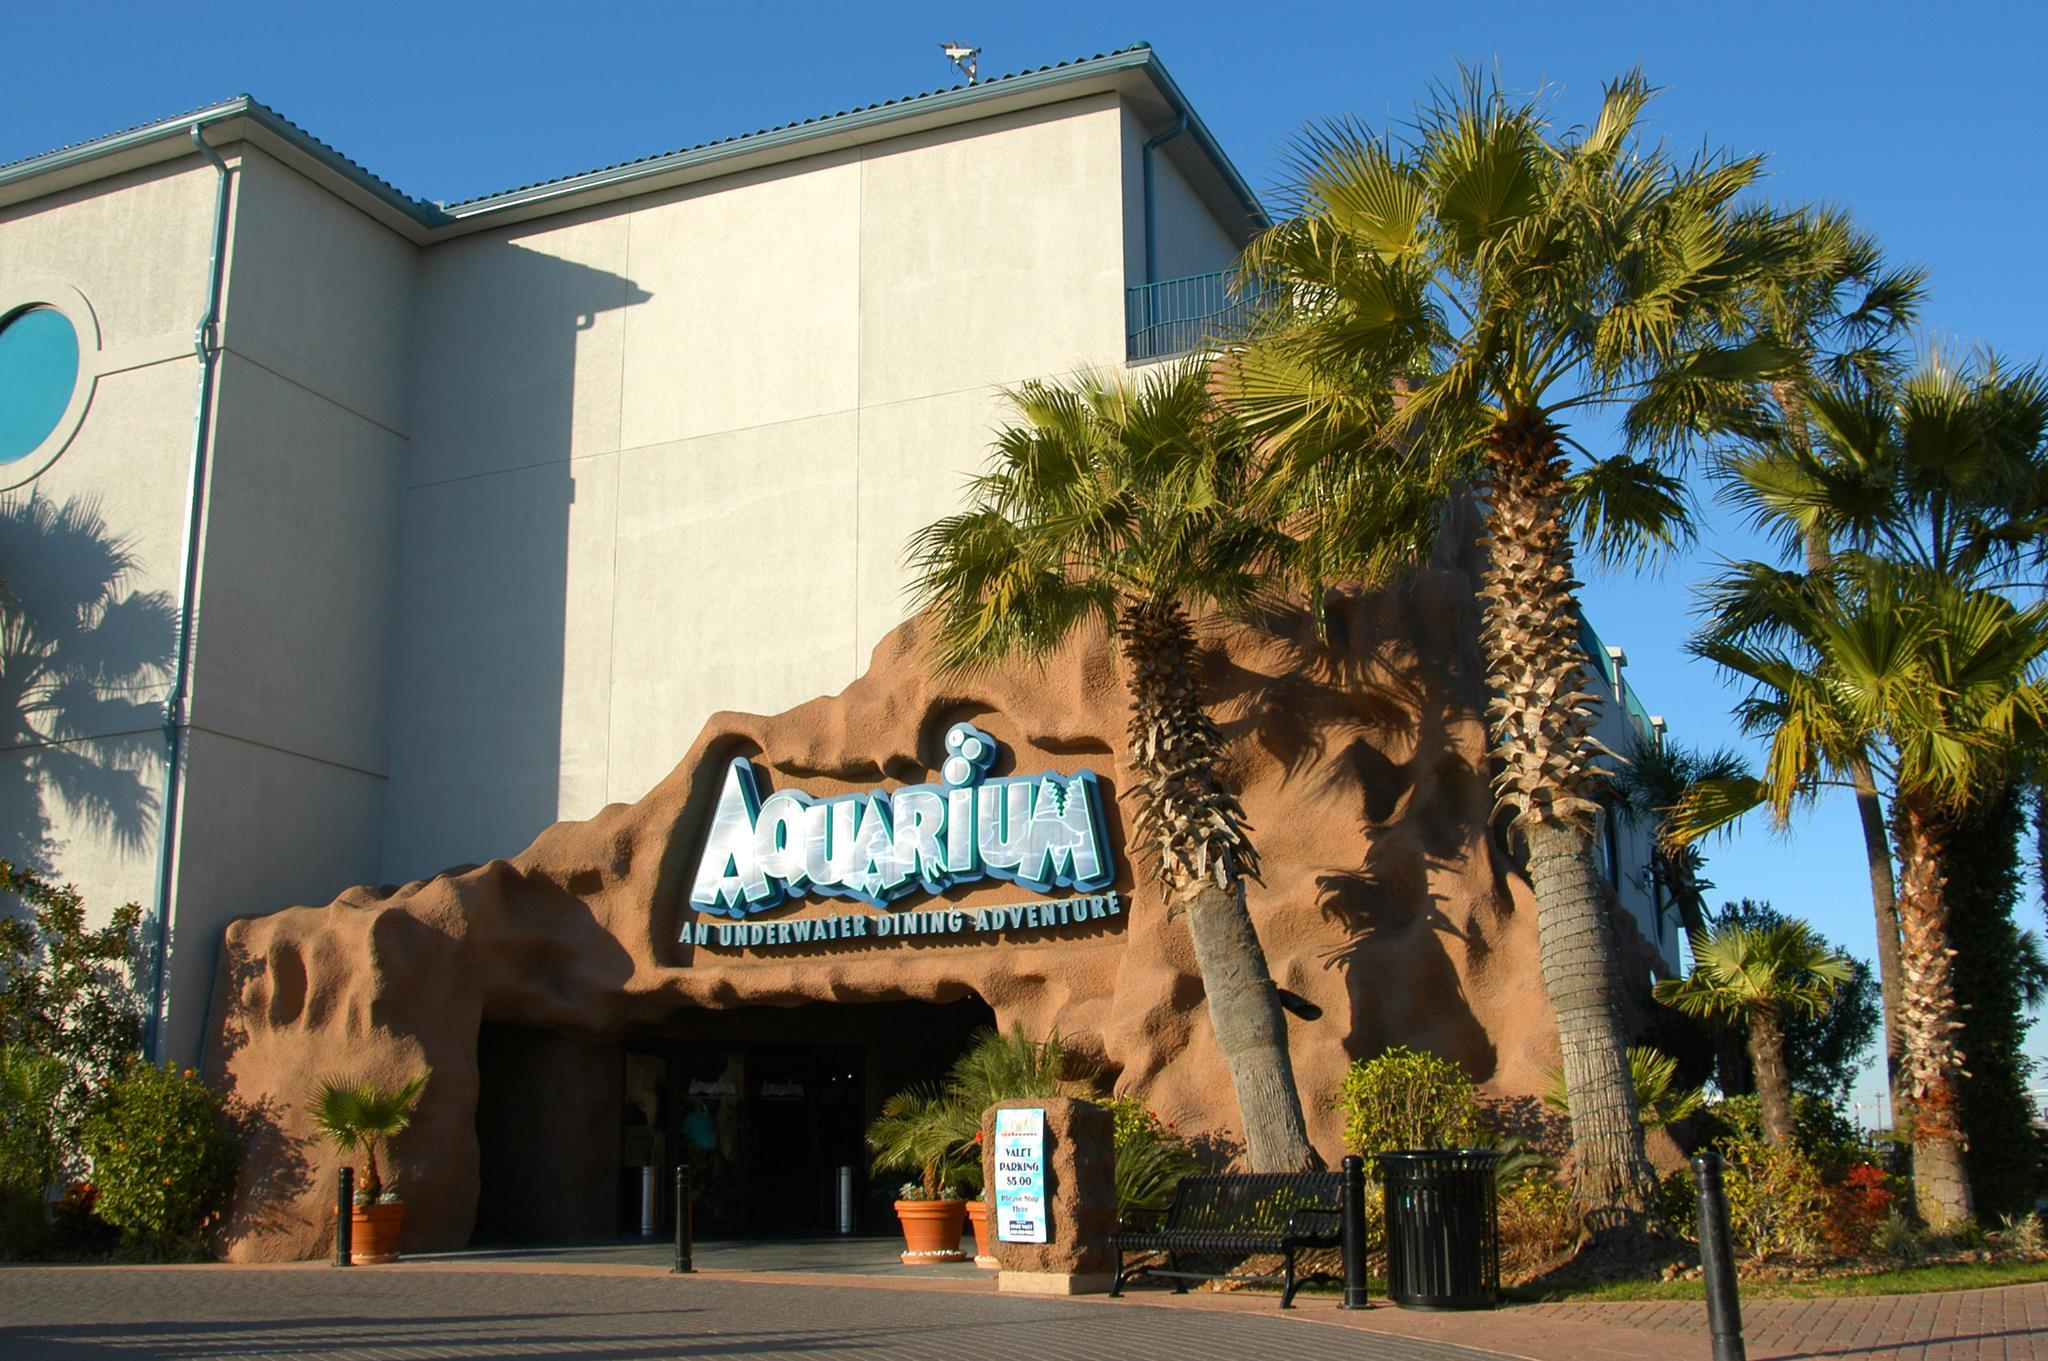 Aquarium Restaurant at #11 Kemah Boardwalk, Kemah, TX on Fave